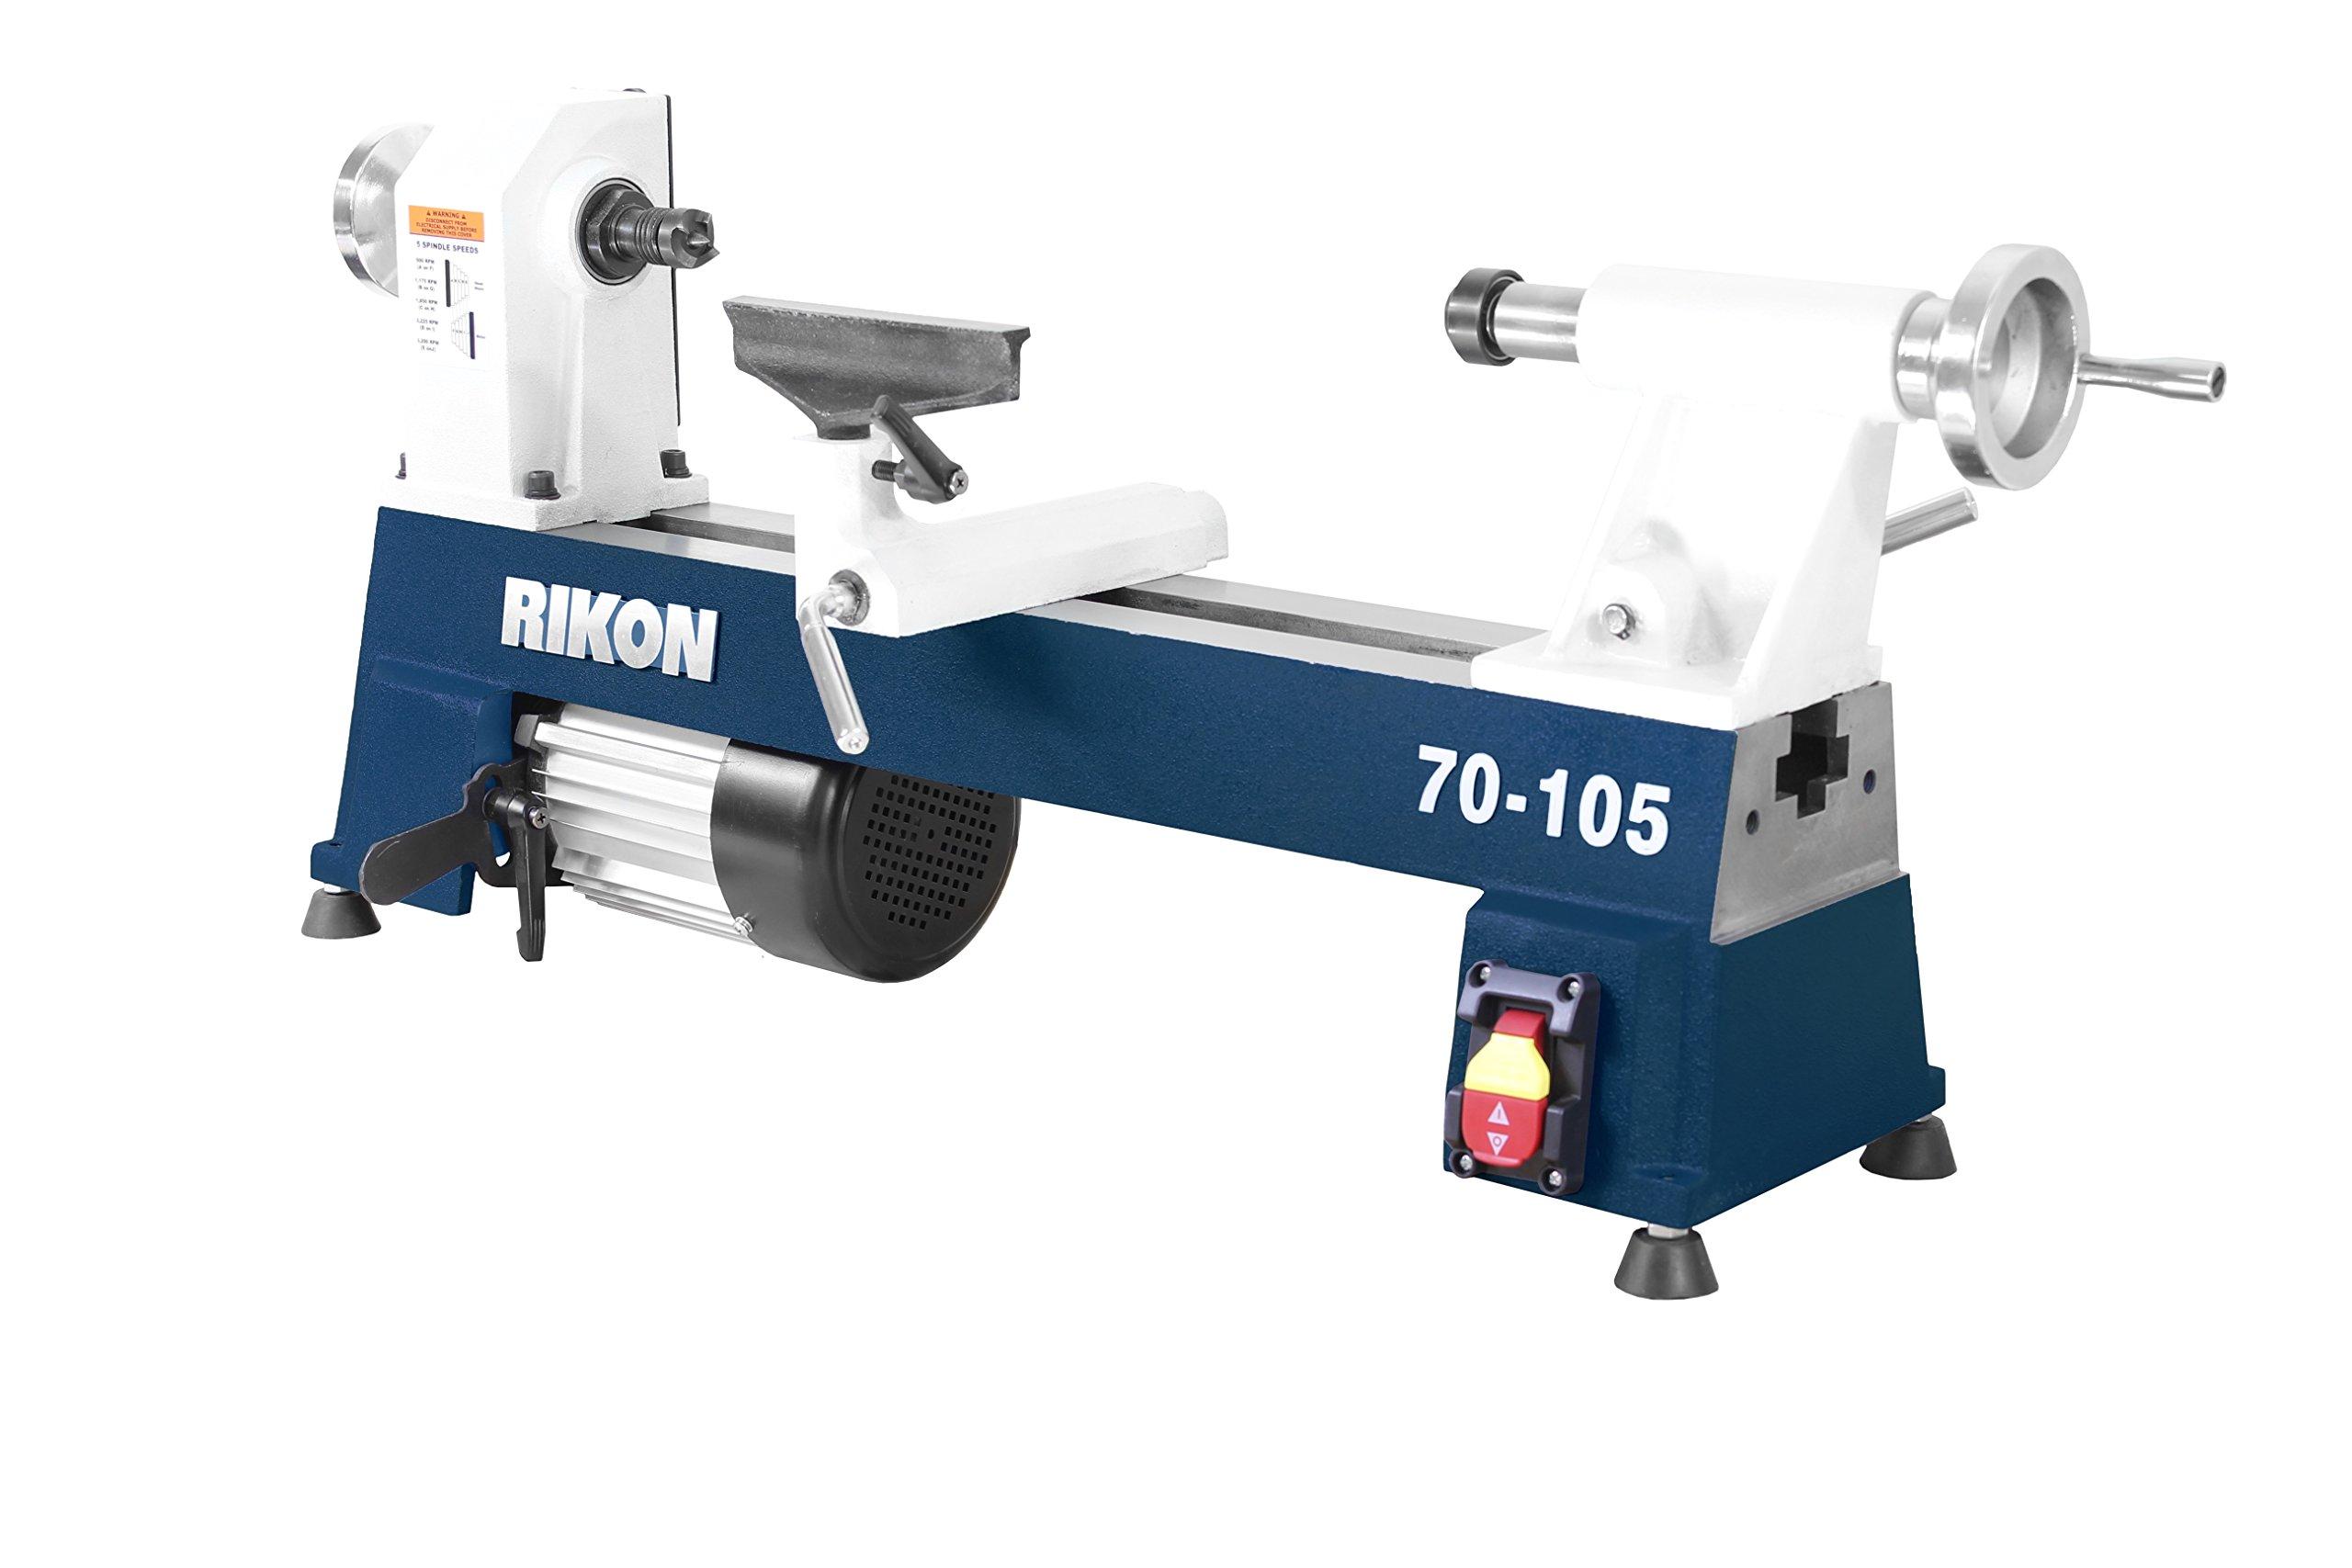 RIKON Power Tools 70 105 Lathe